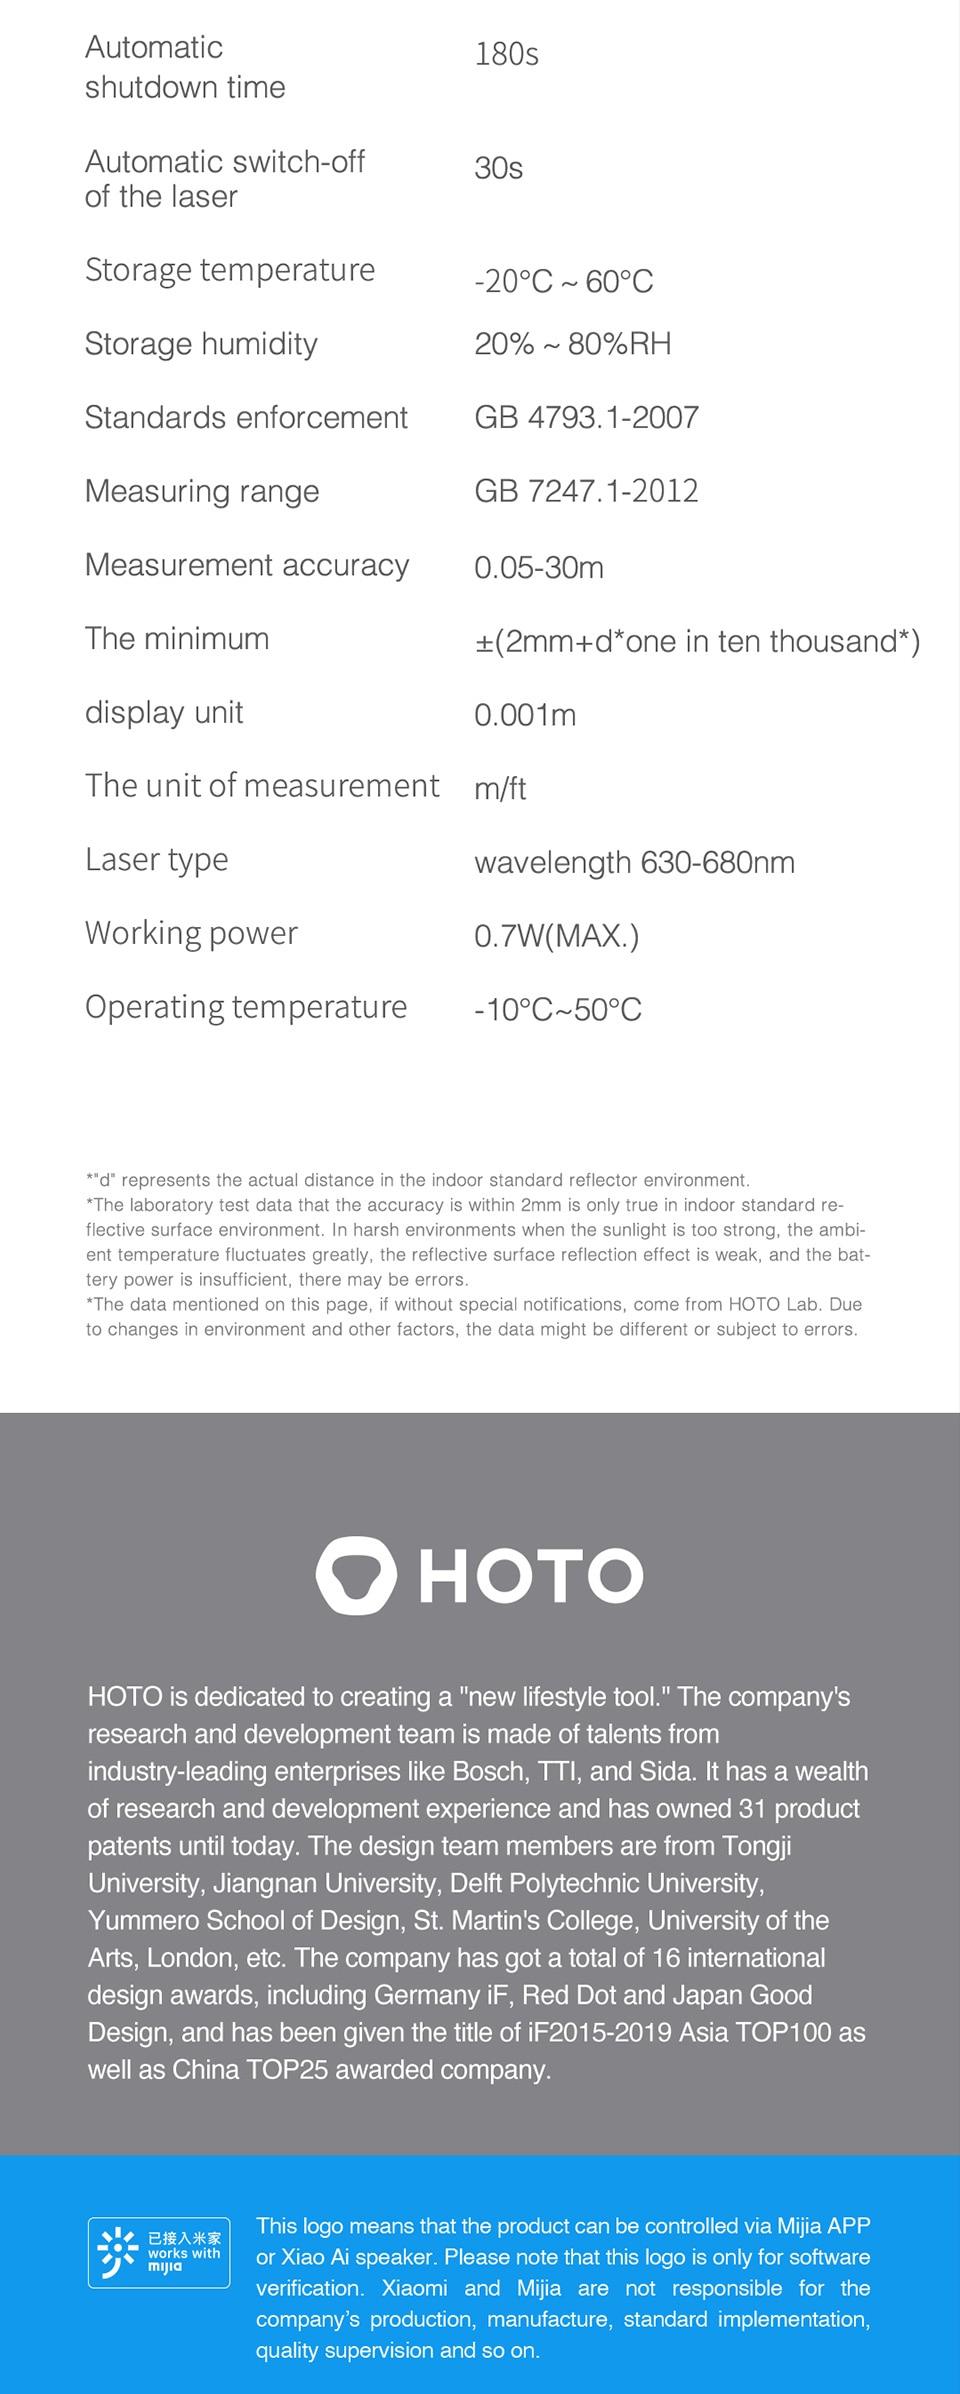 Hea0b21a47c2142be82e919a7a634c706f - ตลับเมตรเลเซอร์ วัดระยะทาง Rangefinder 30M หน้าจอแสดงผล OLED วัดระยะห่างด้วยแสงเลเซอร์ เชื่อมต่อโทรศัพท์มือถือ